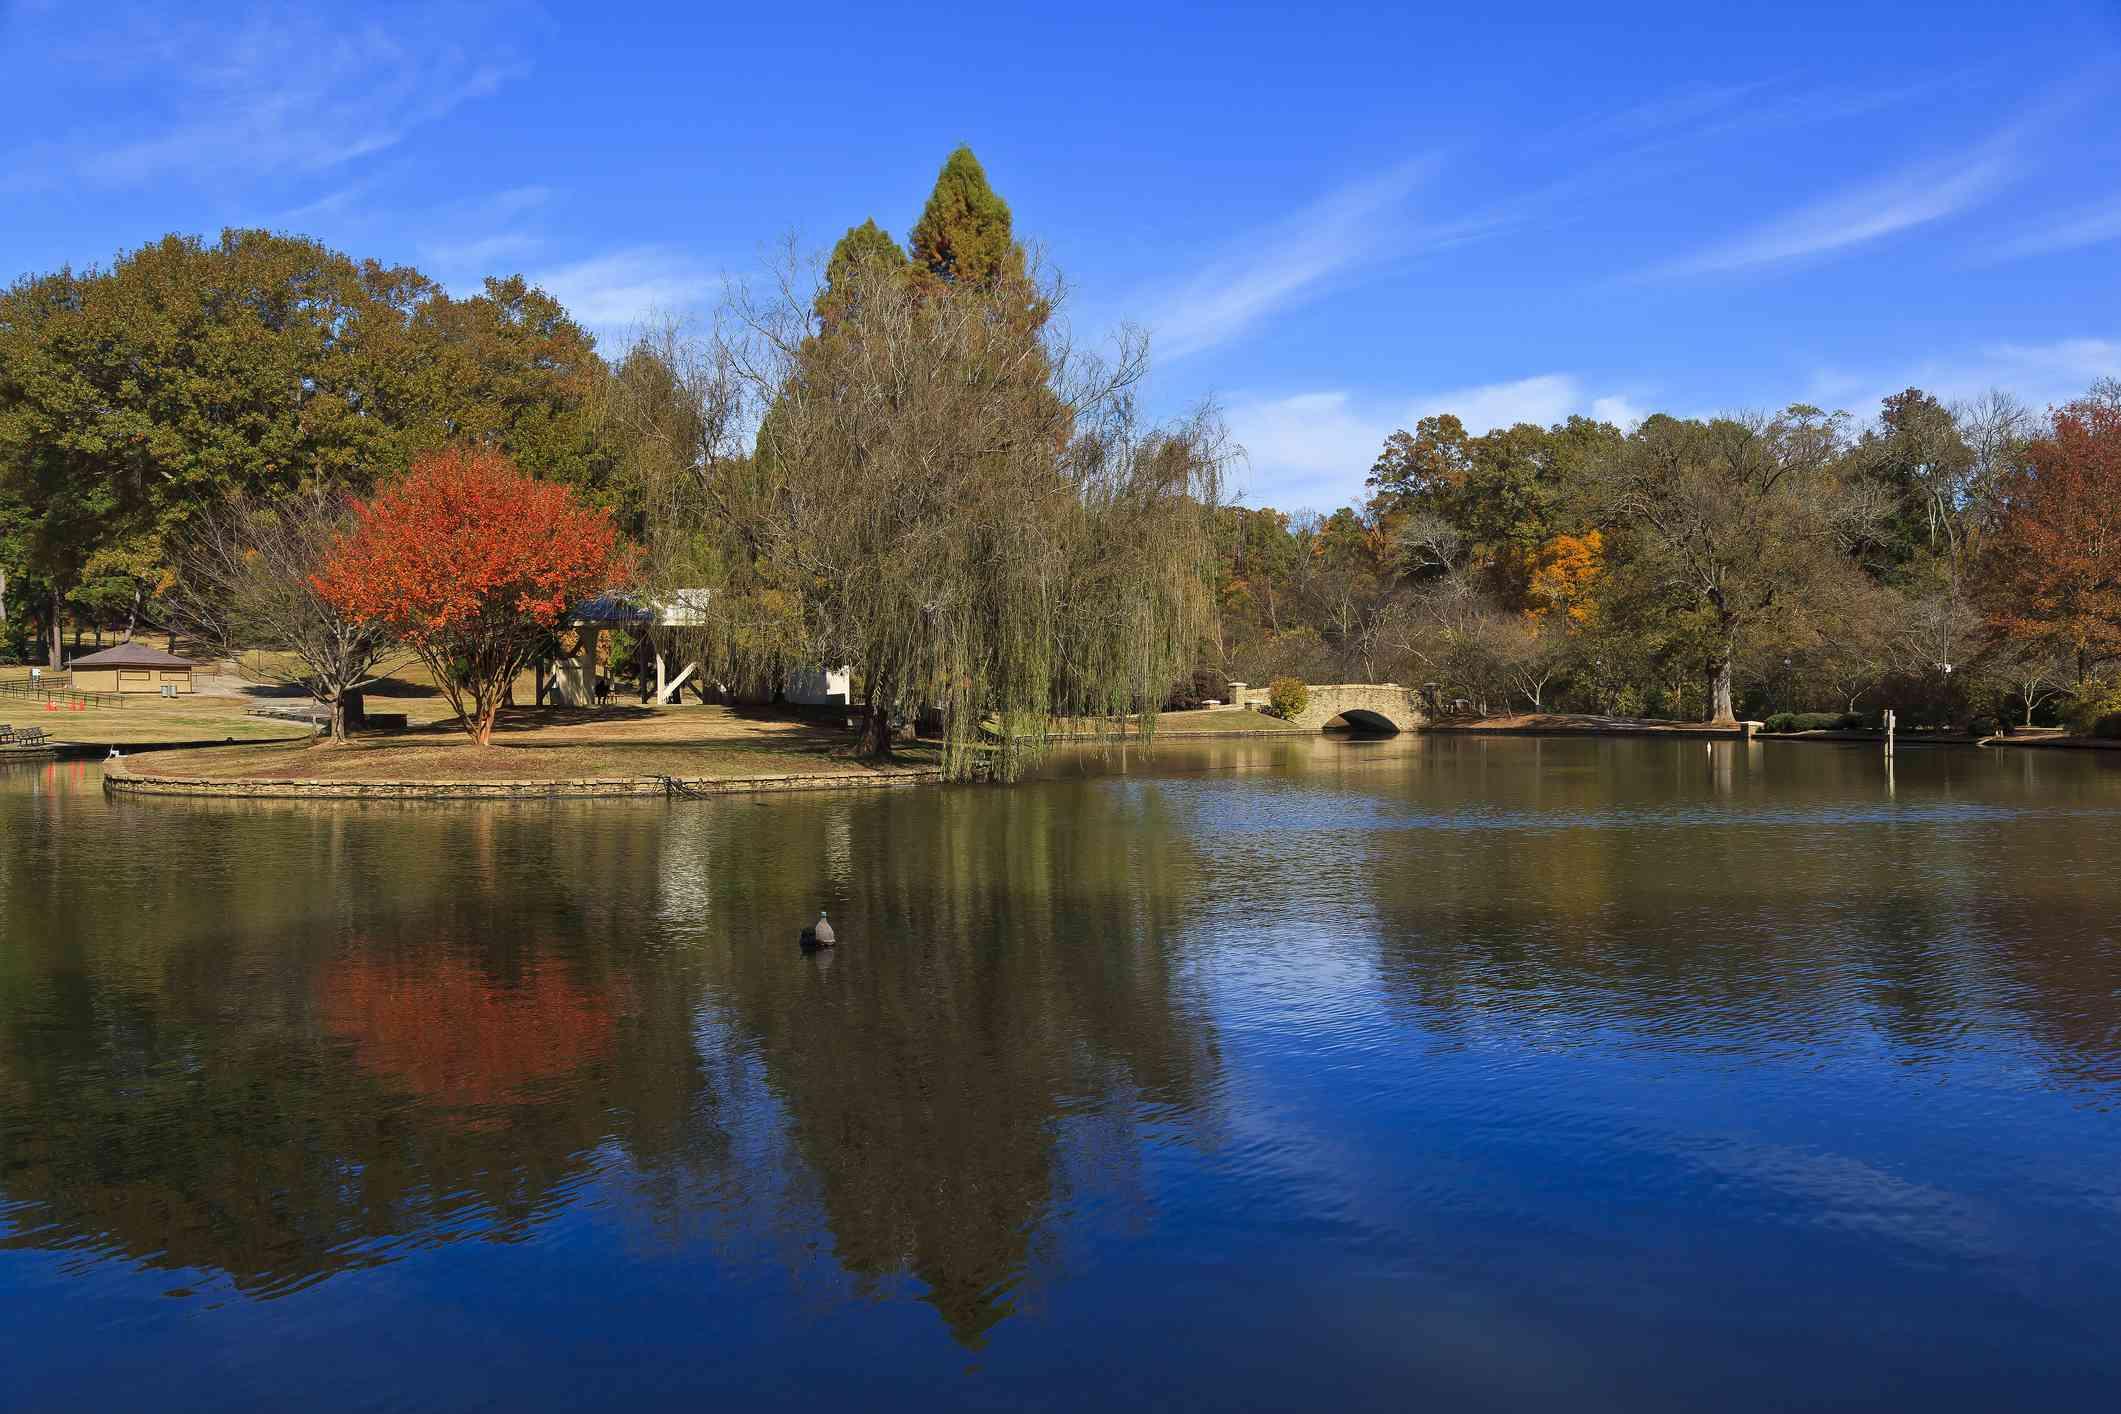 Freedom Park Lake in Charlotte, NC